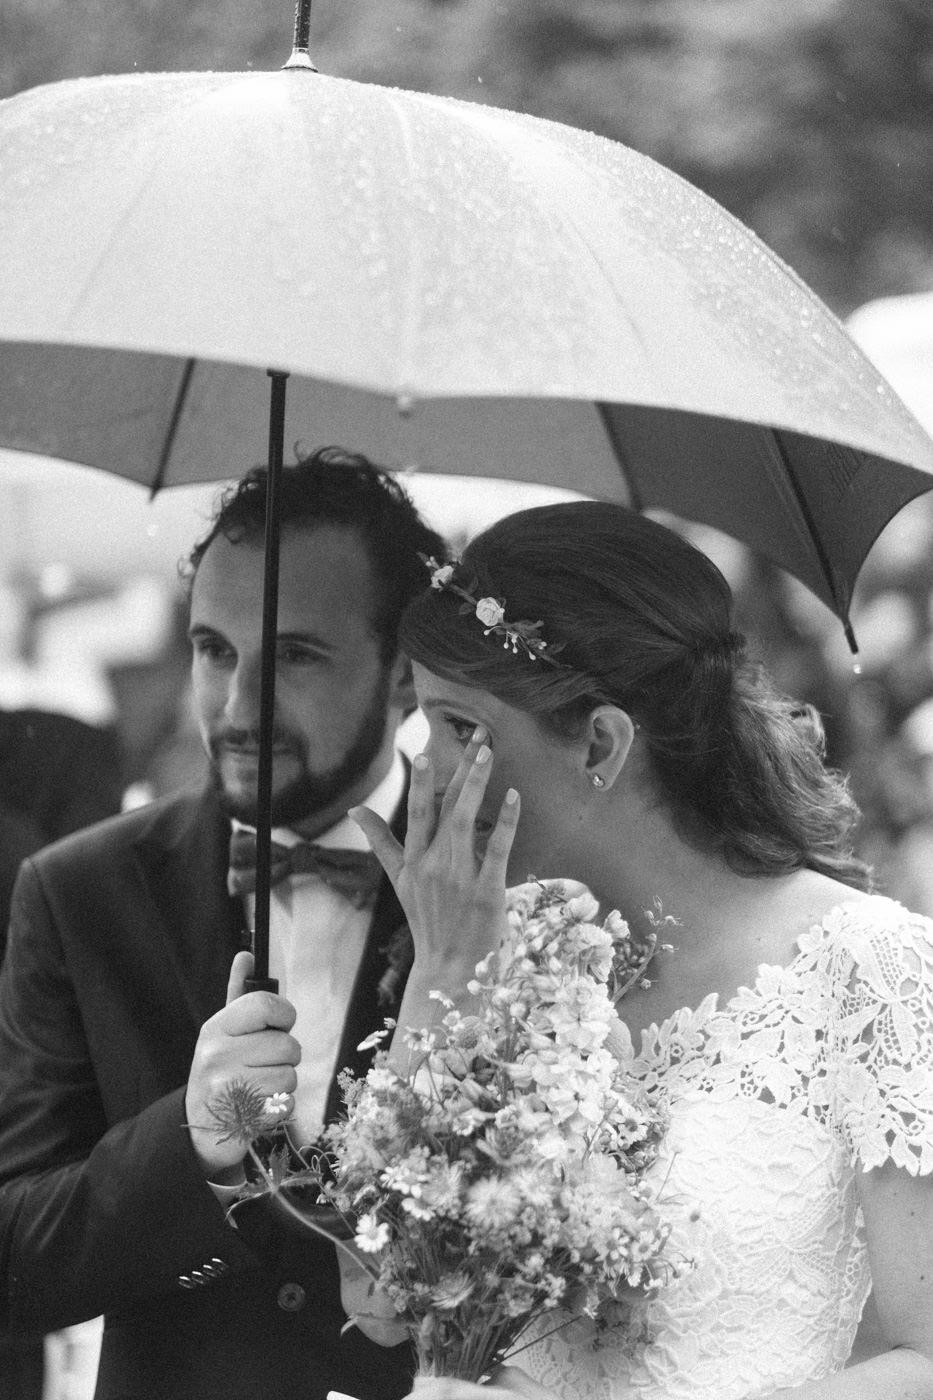 matrimoni_all_italiana_fotografo_matrimonio_toscana-32.jpg